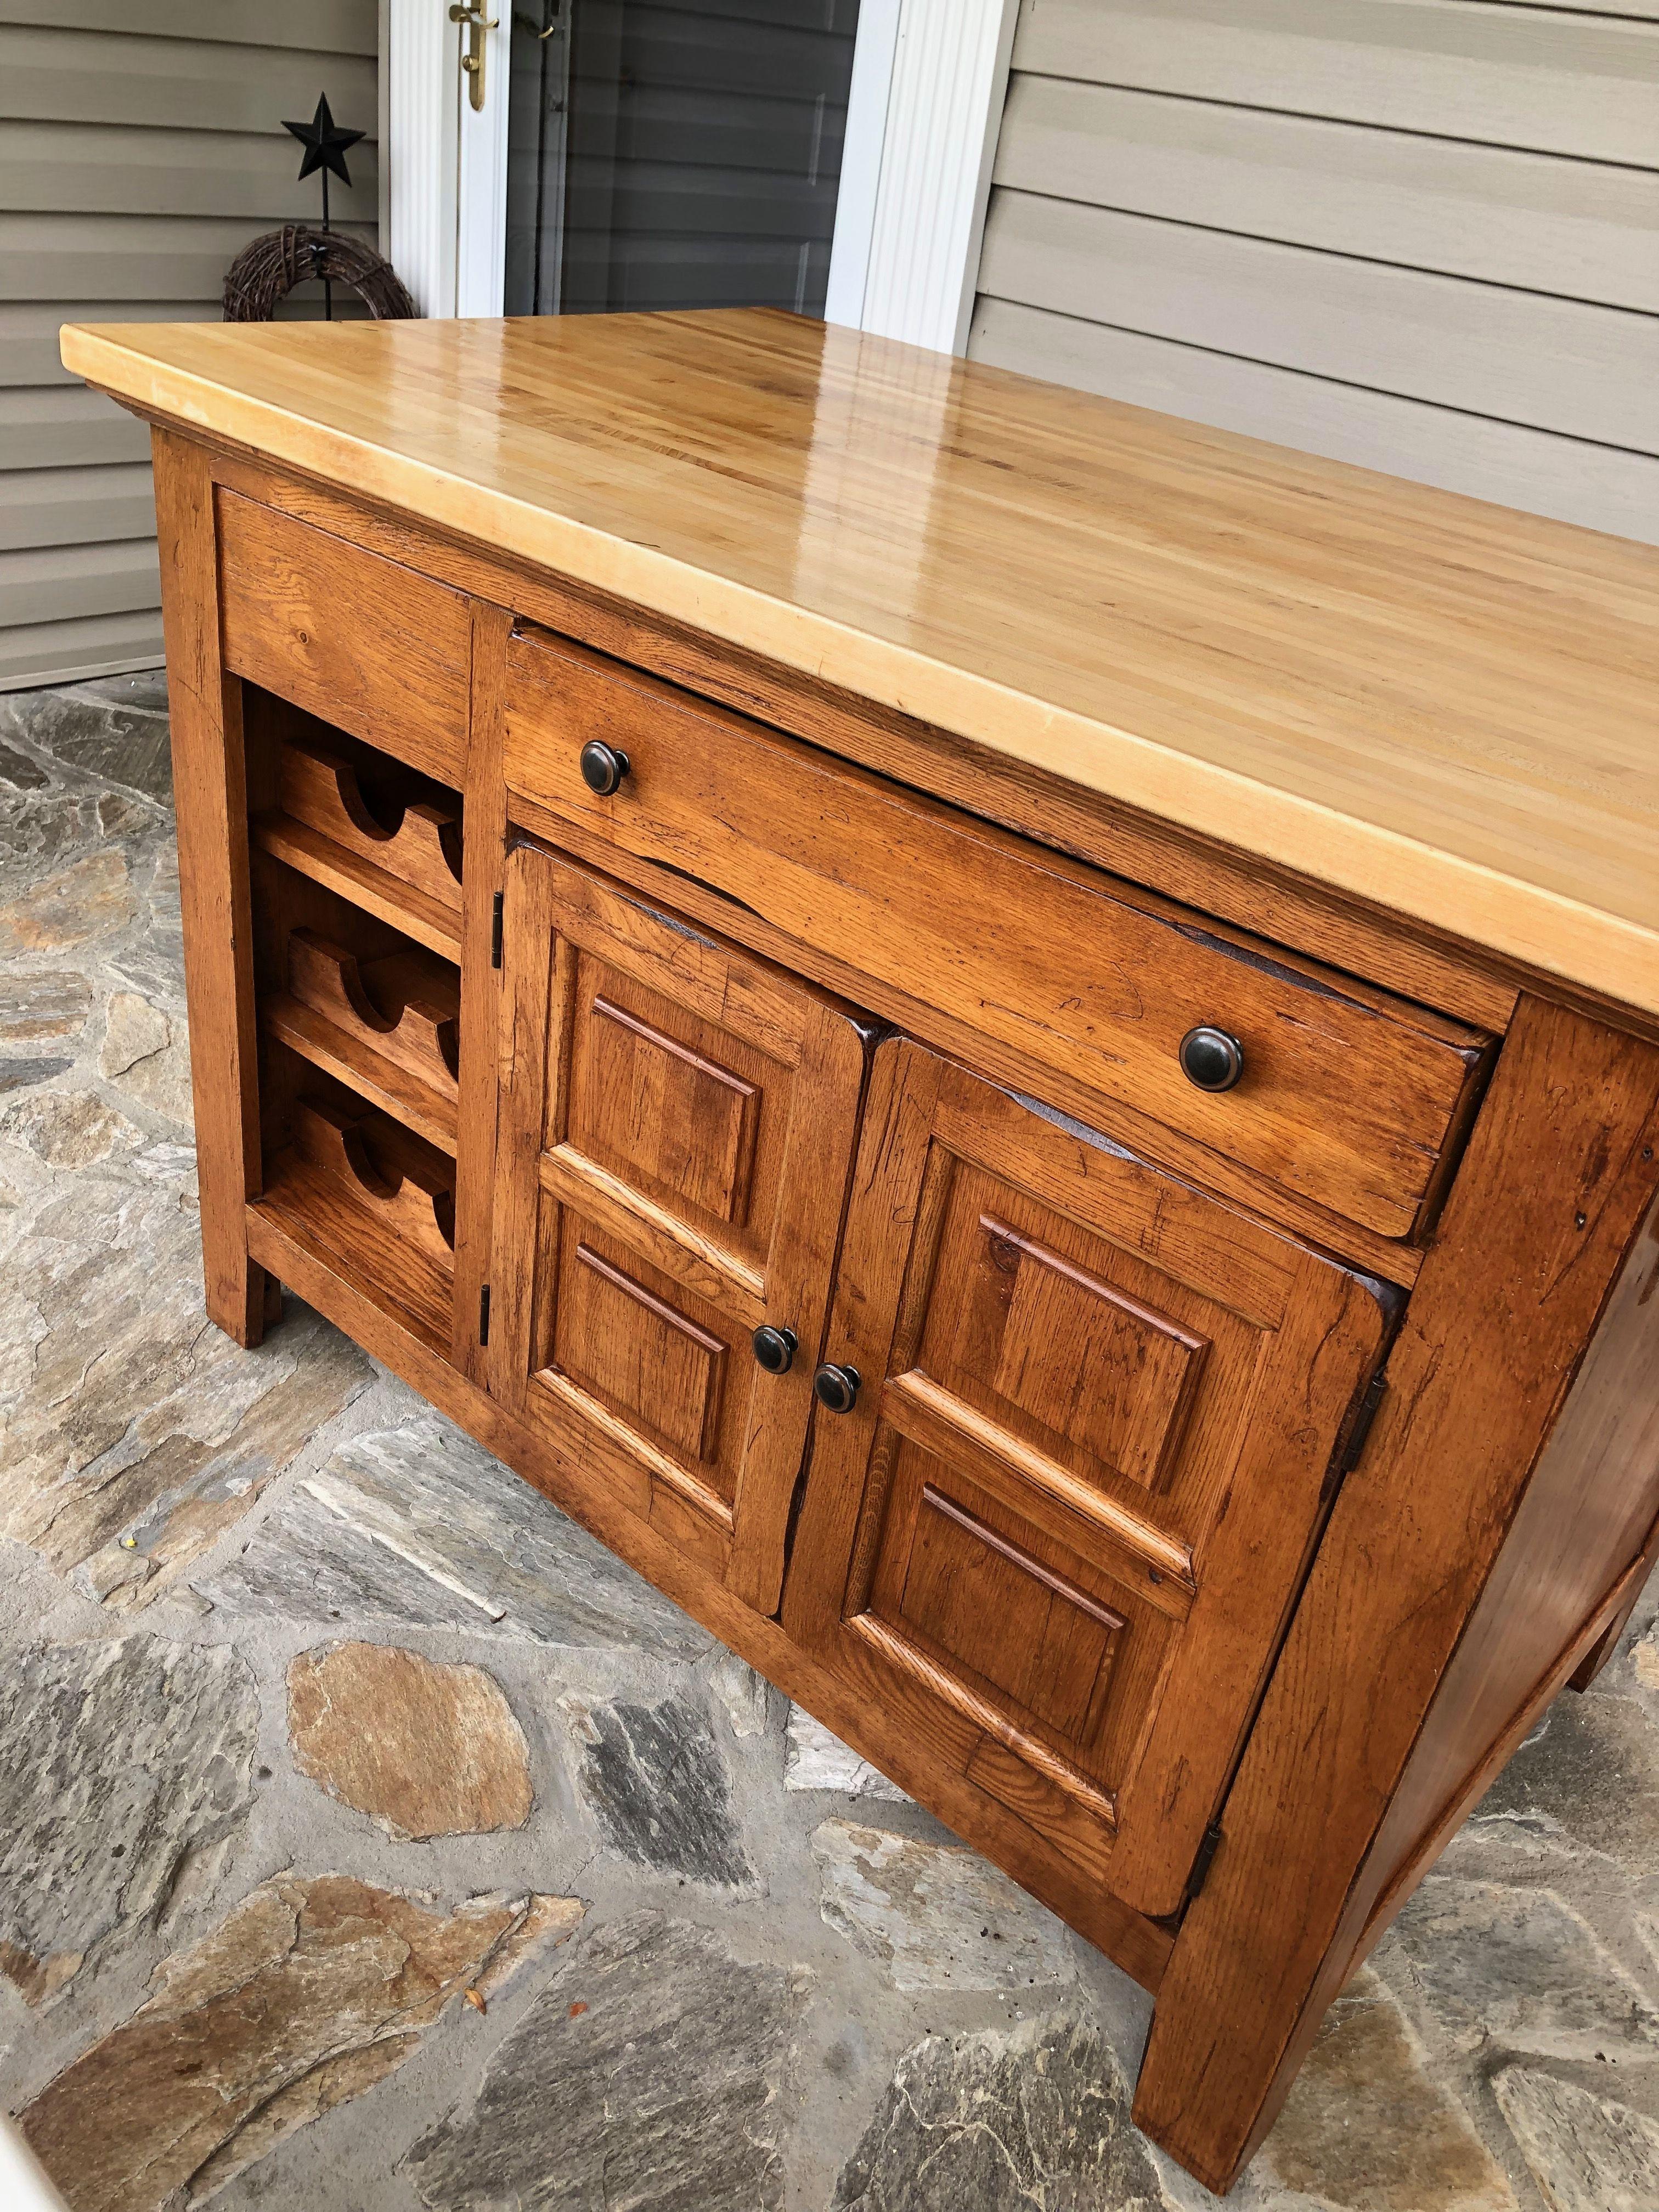 Broyhill Attic Heirlooms Oak Island Update Cabinets Broyhill Home Decor